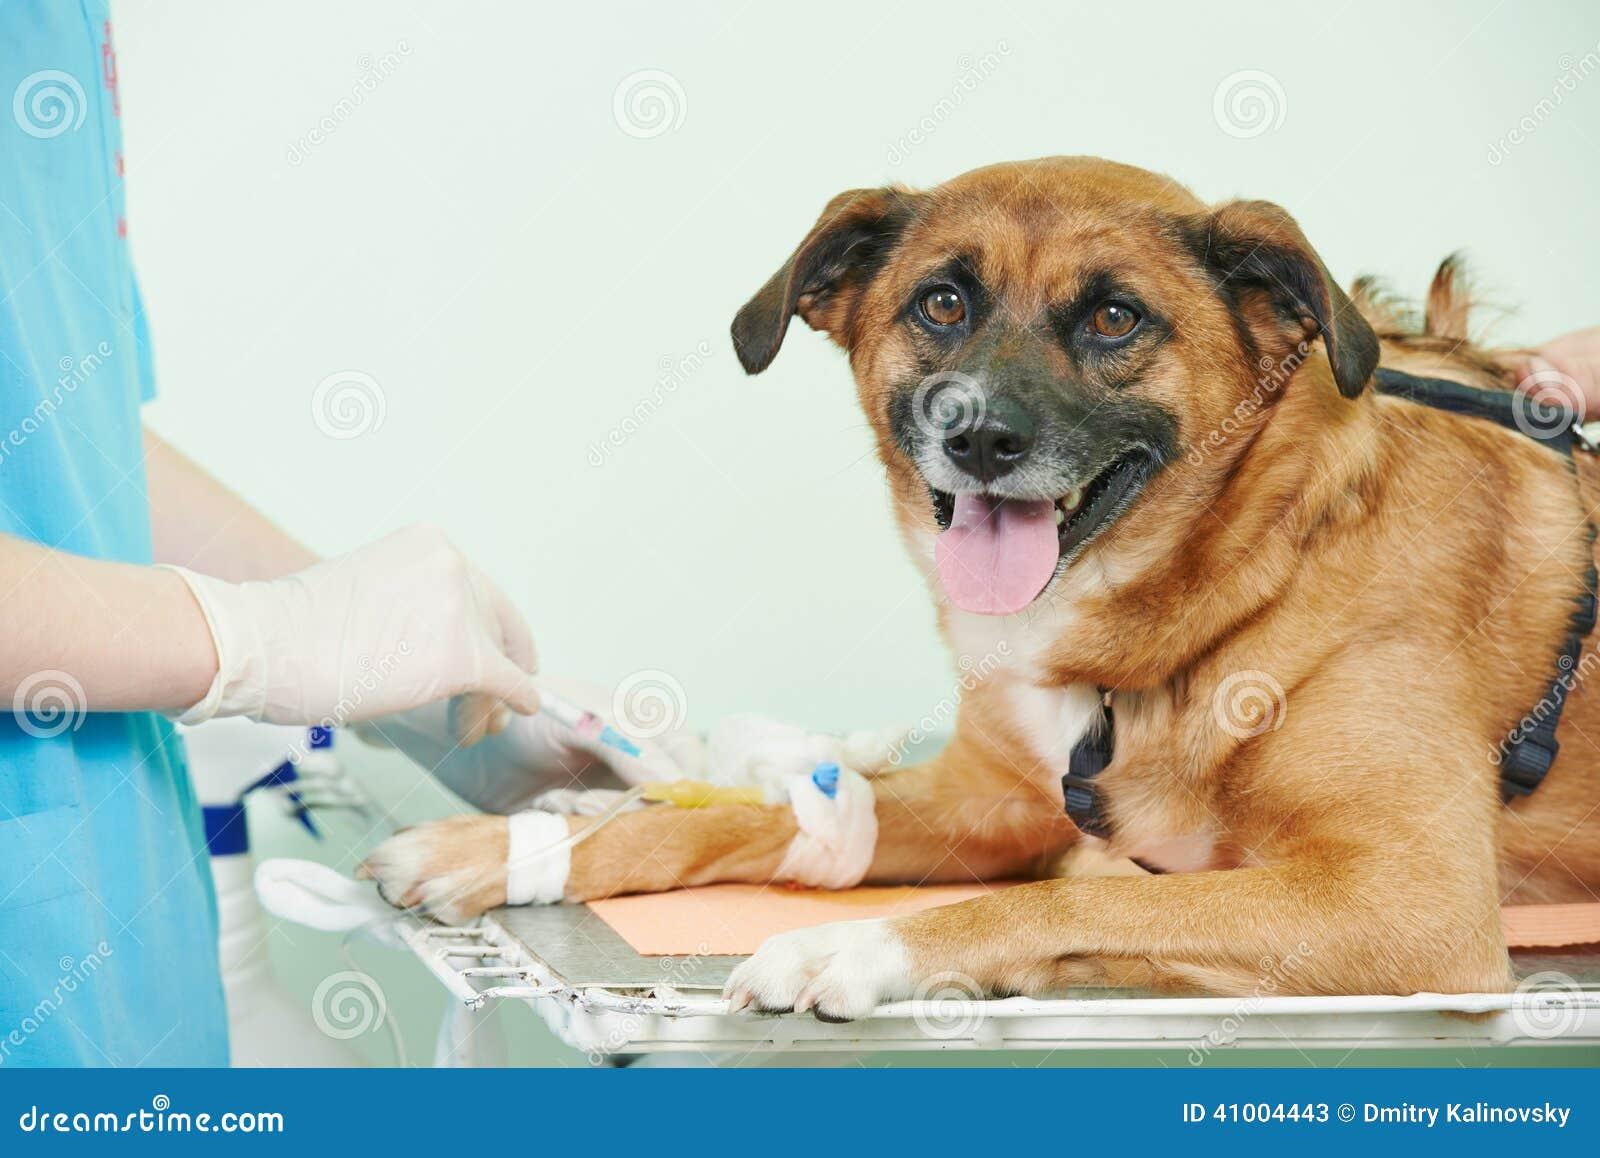 Dog Breed Test At Vet